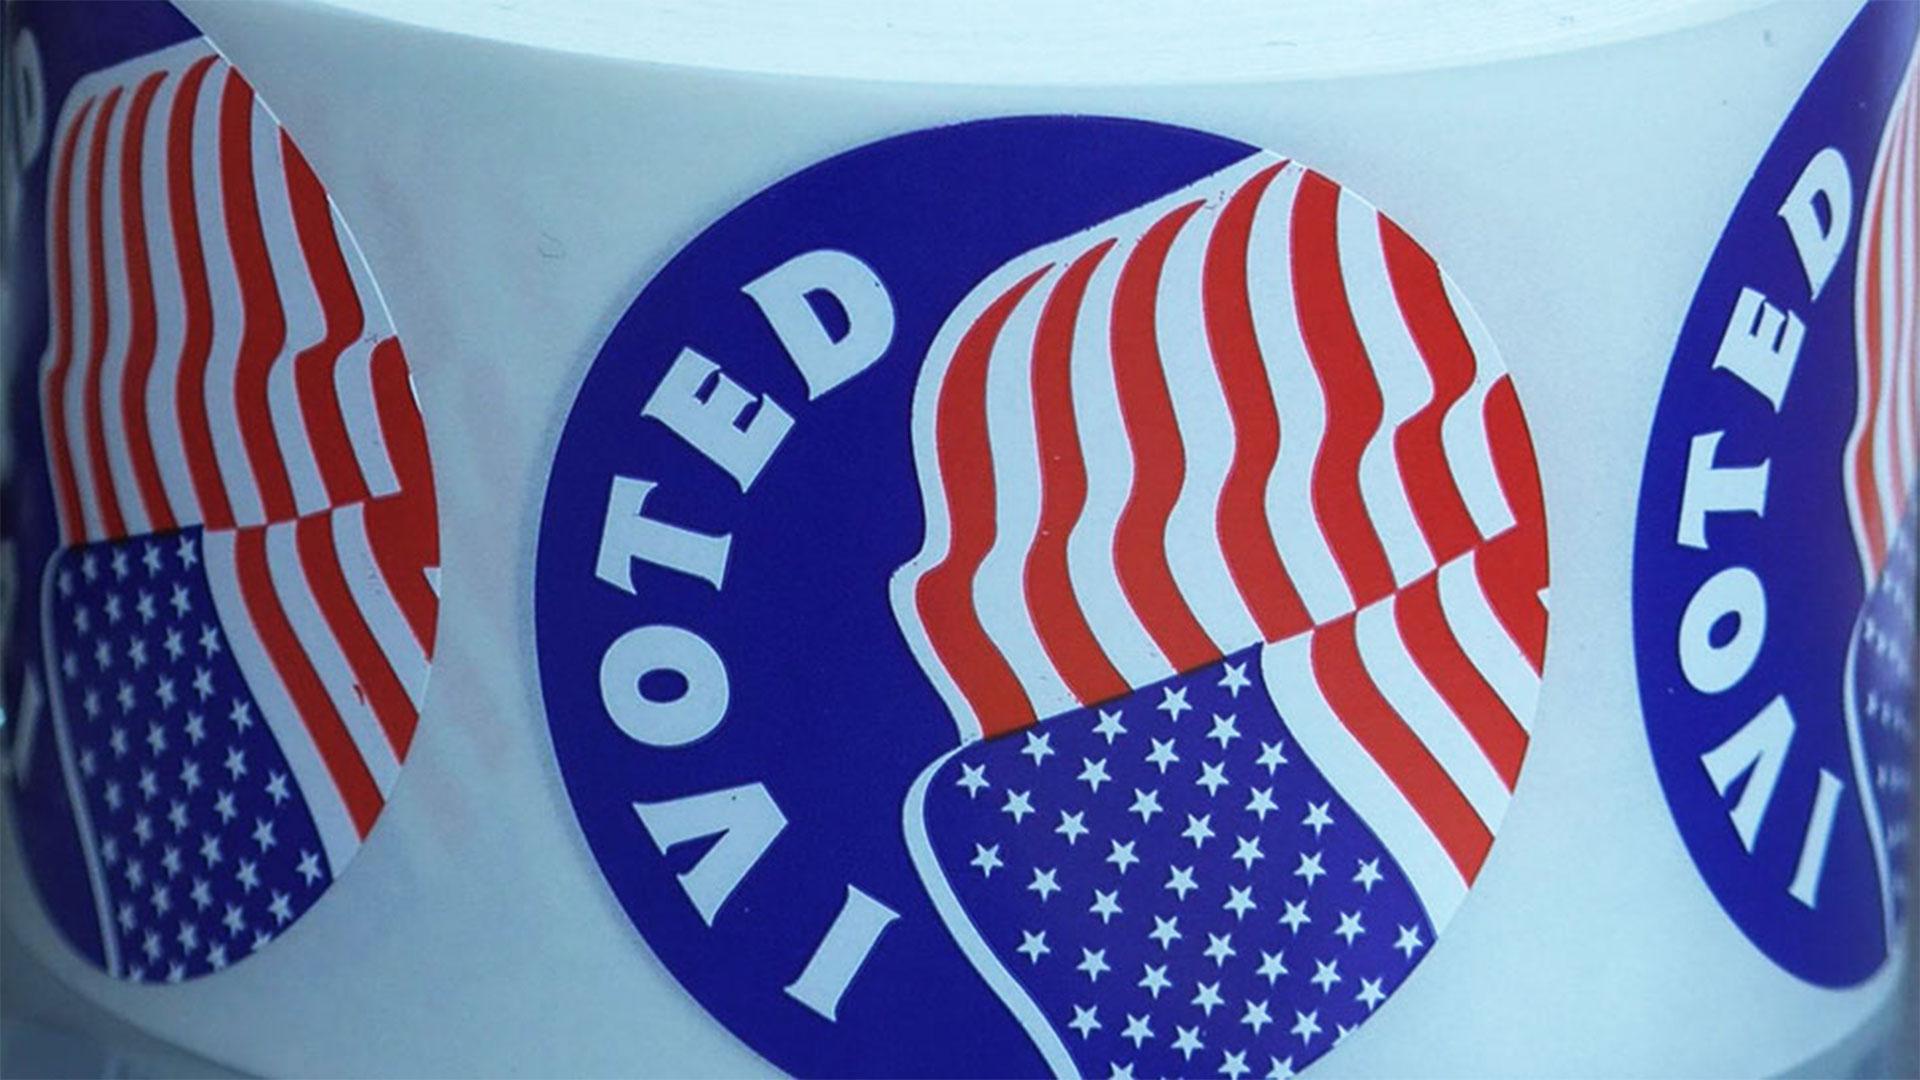 Absentee Voting Underway In South Dakota Ahead Of Midterm Elections